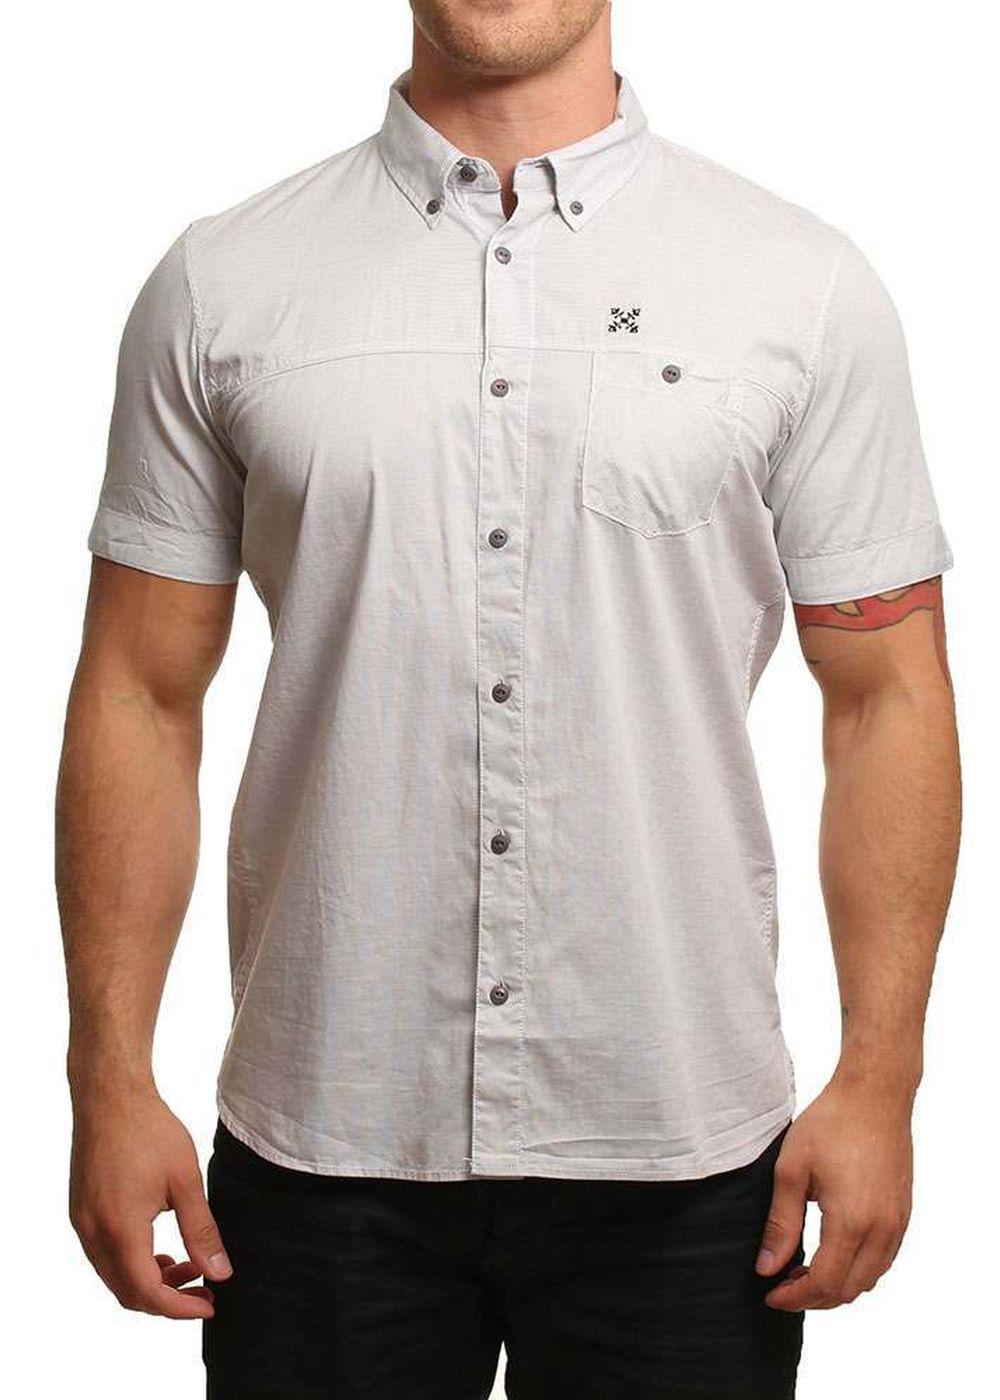 oxbow-manubri-ss-shirt-gris